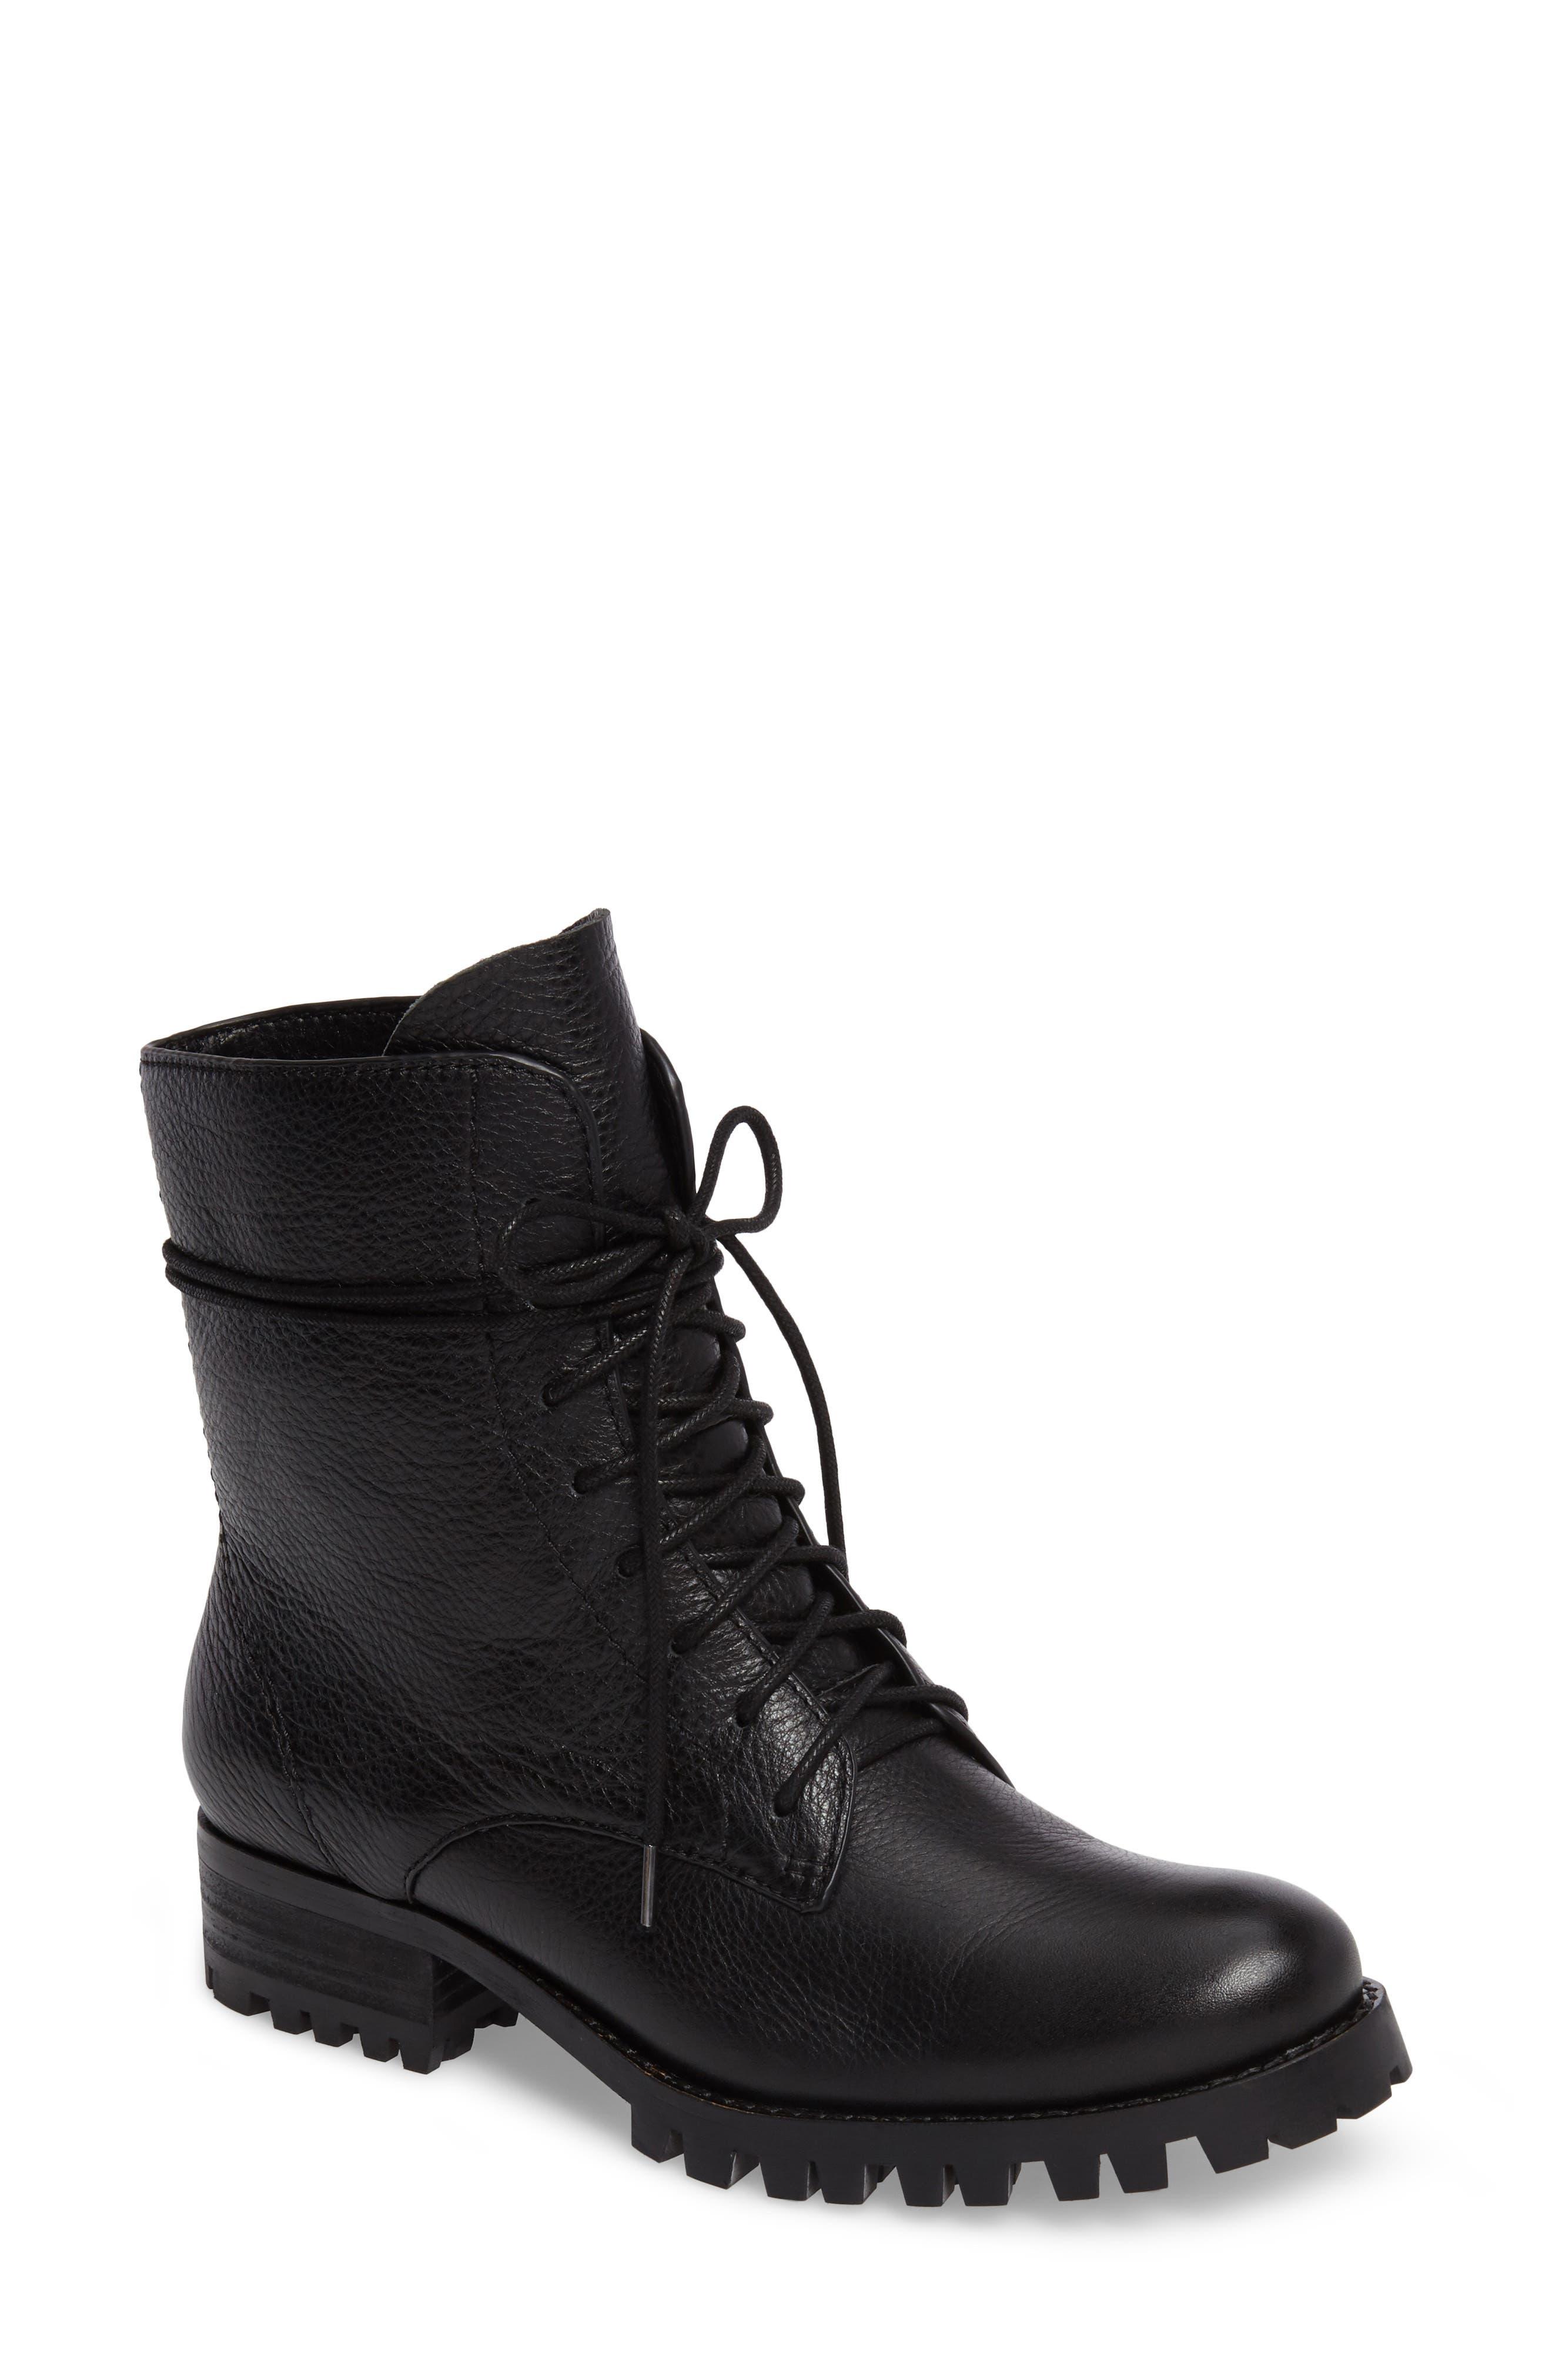 Alternate Image 1 Selected - Splendid Romy II Combat Boot (Women)